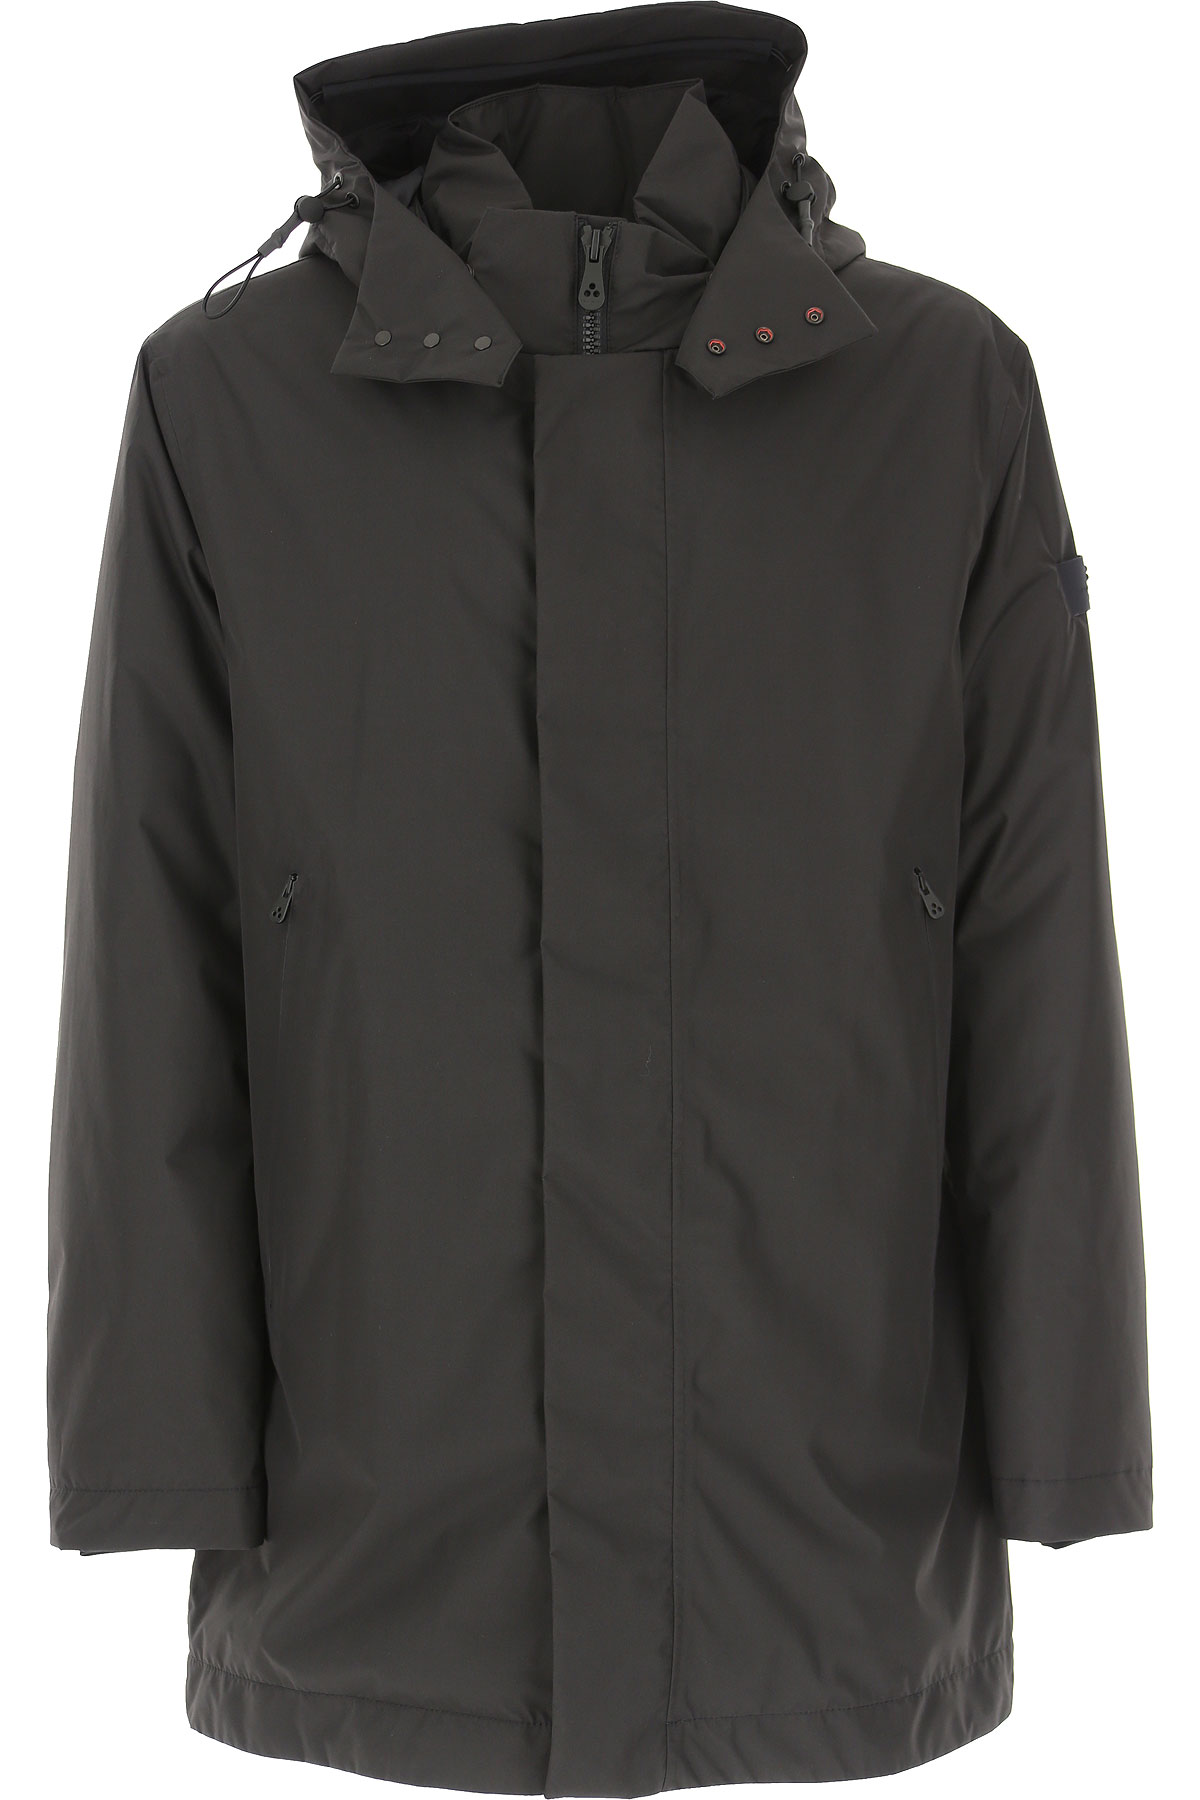 Peuterey Down Jacket for Men, Puffer Ski Jacket On Sale, Black, Down, 2019, L S XL